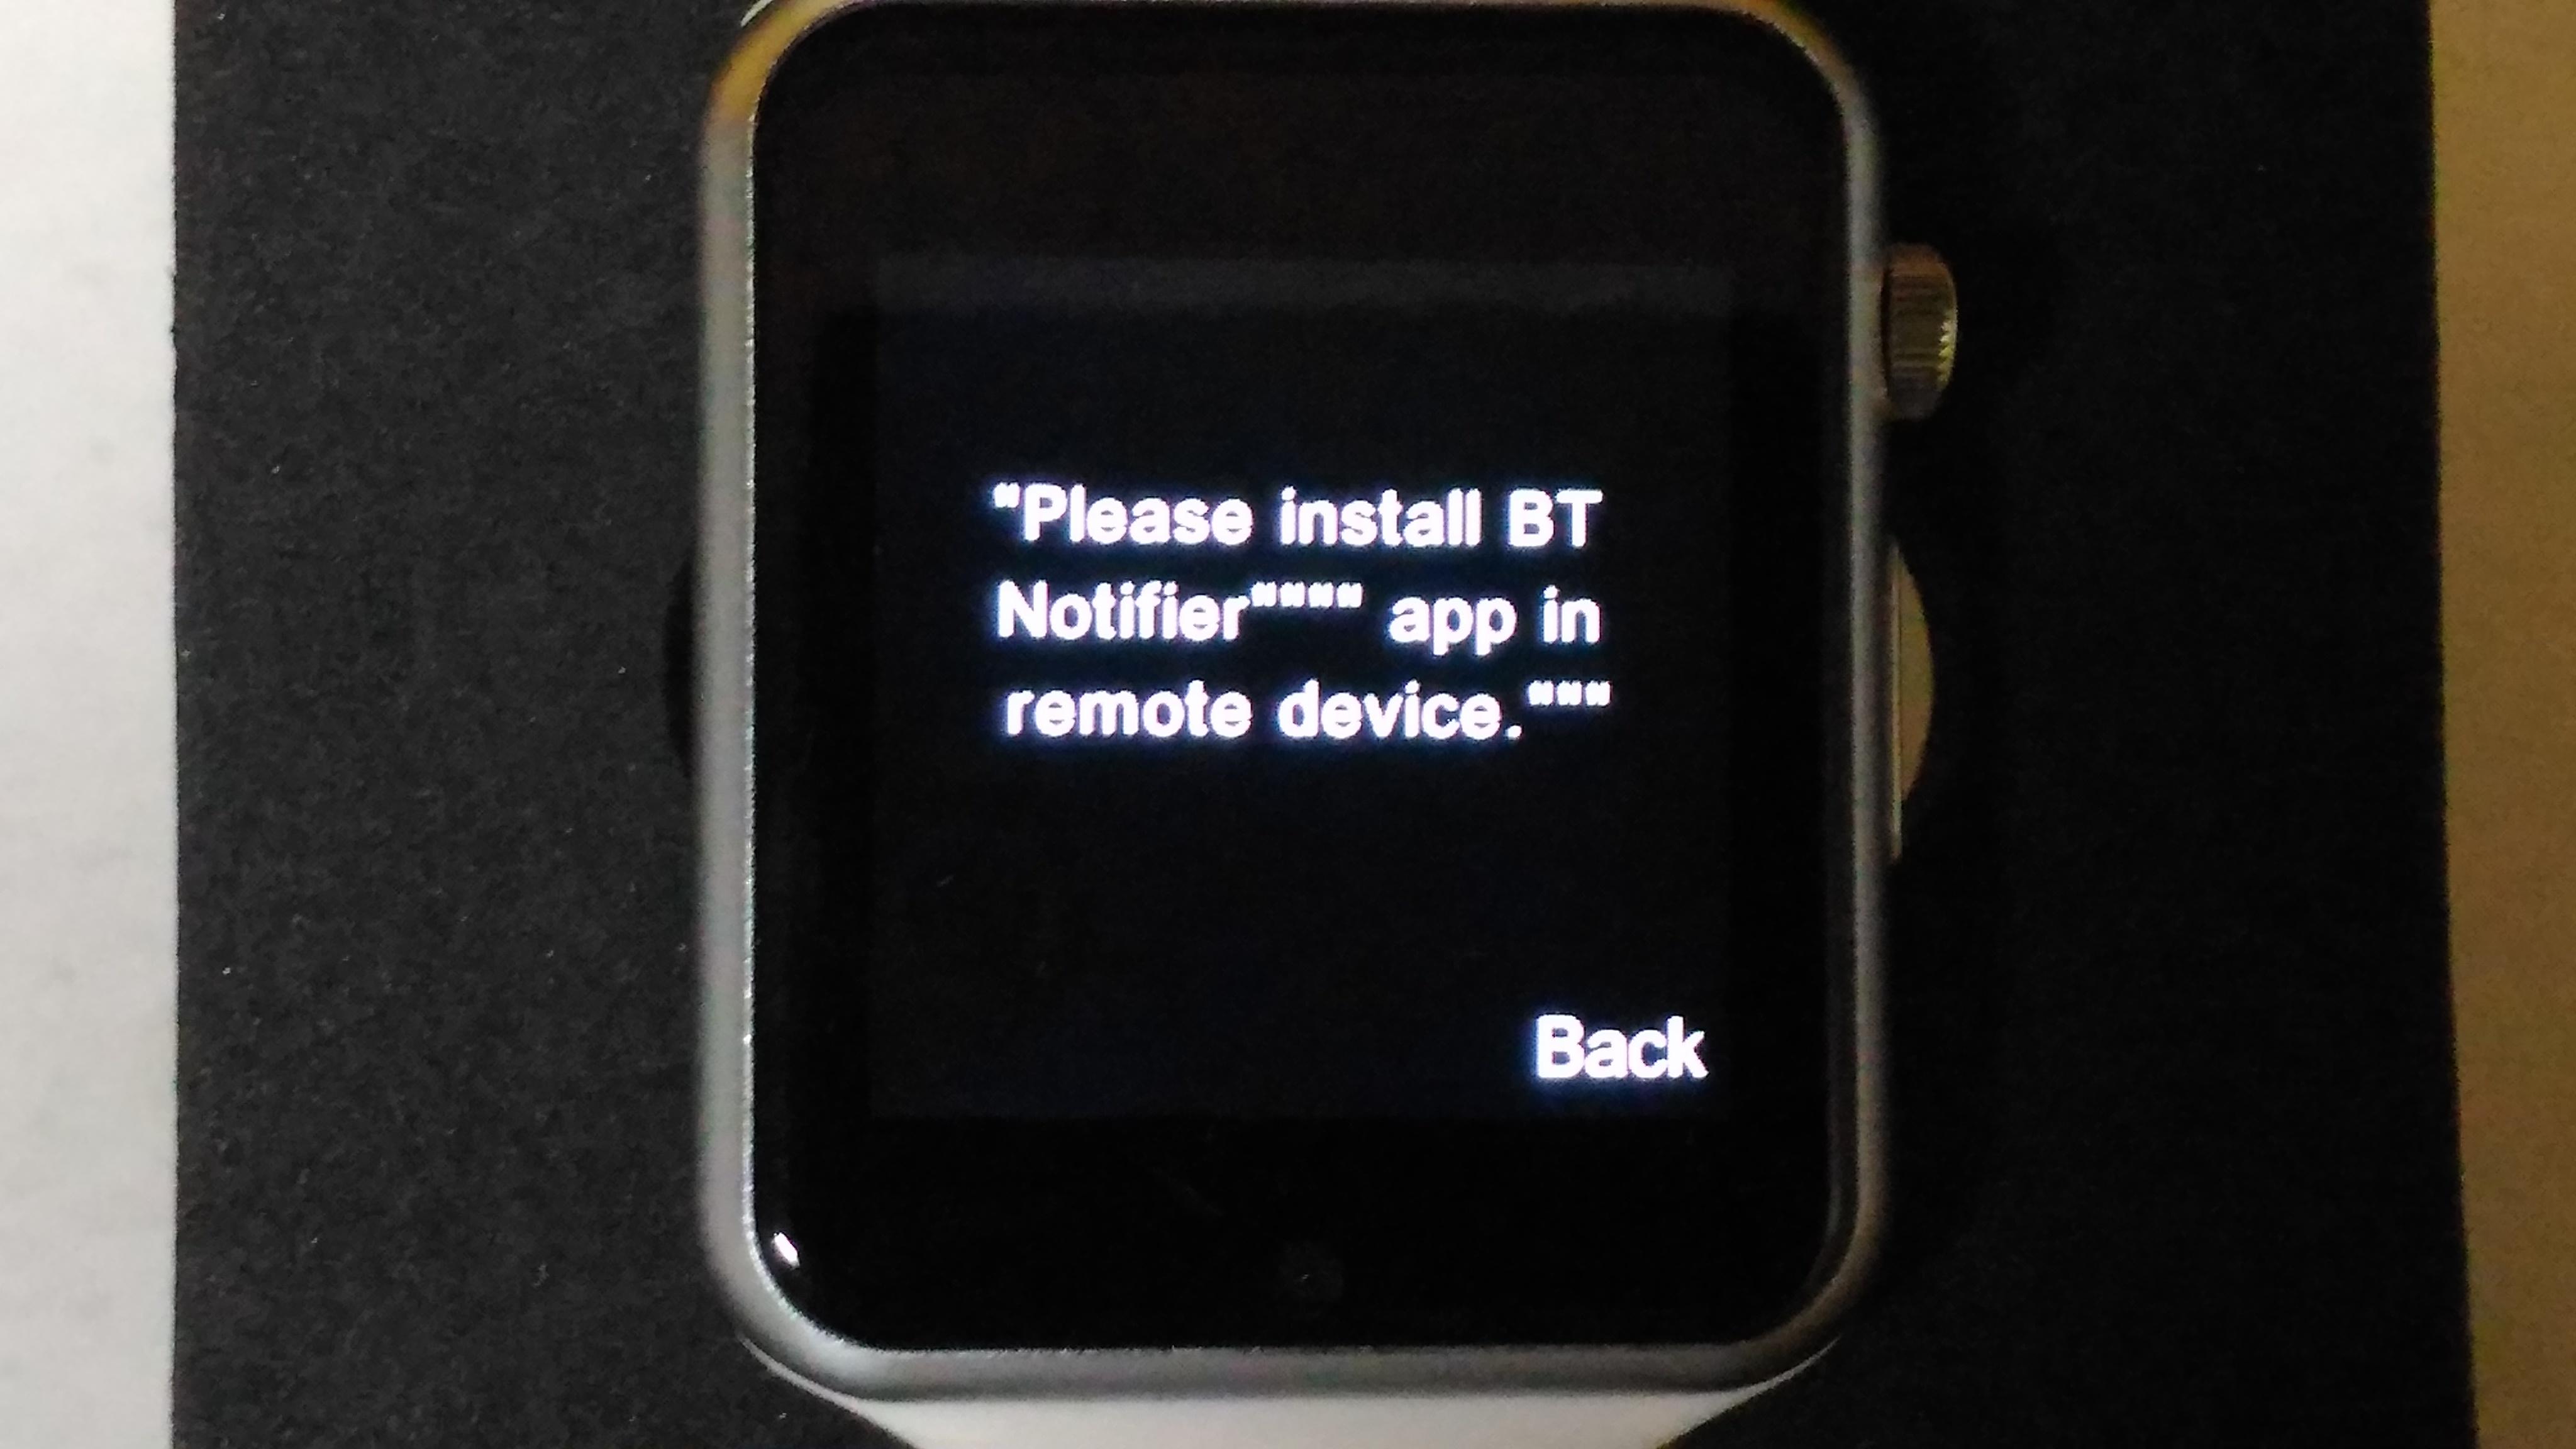 please install bt notifier